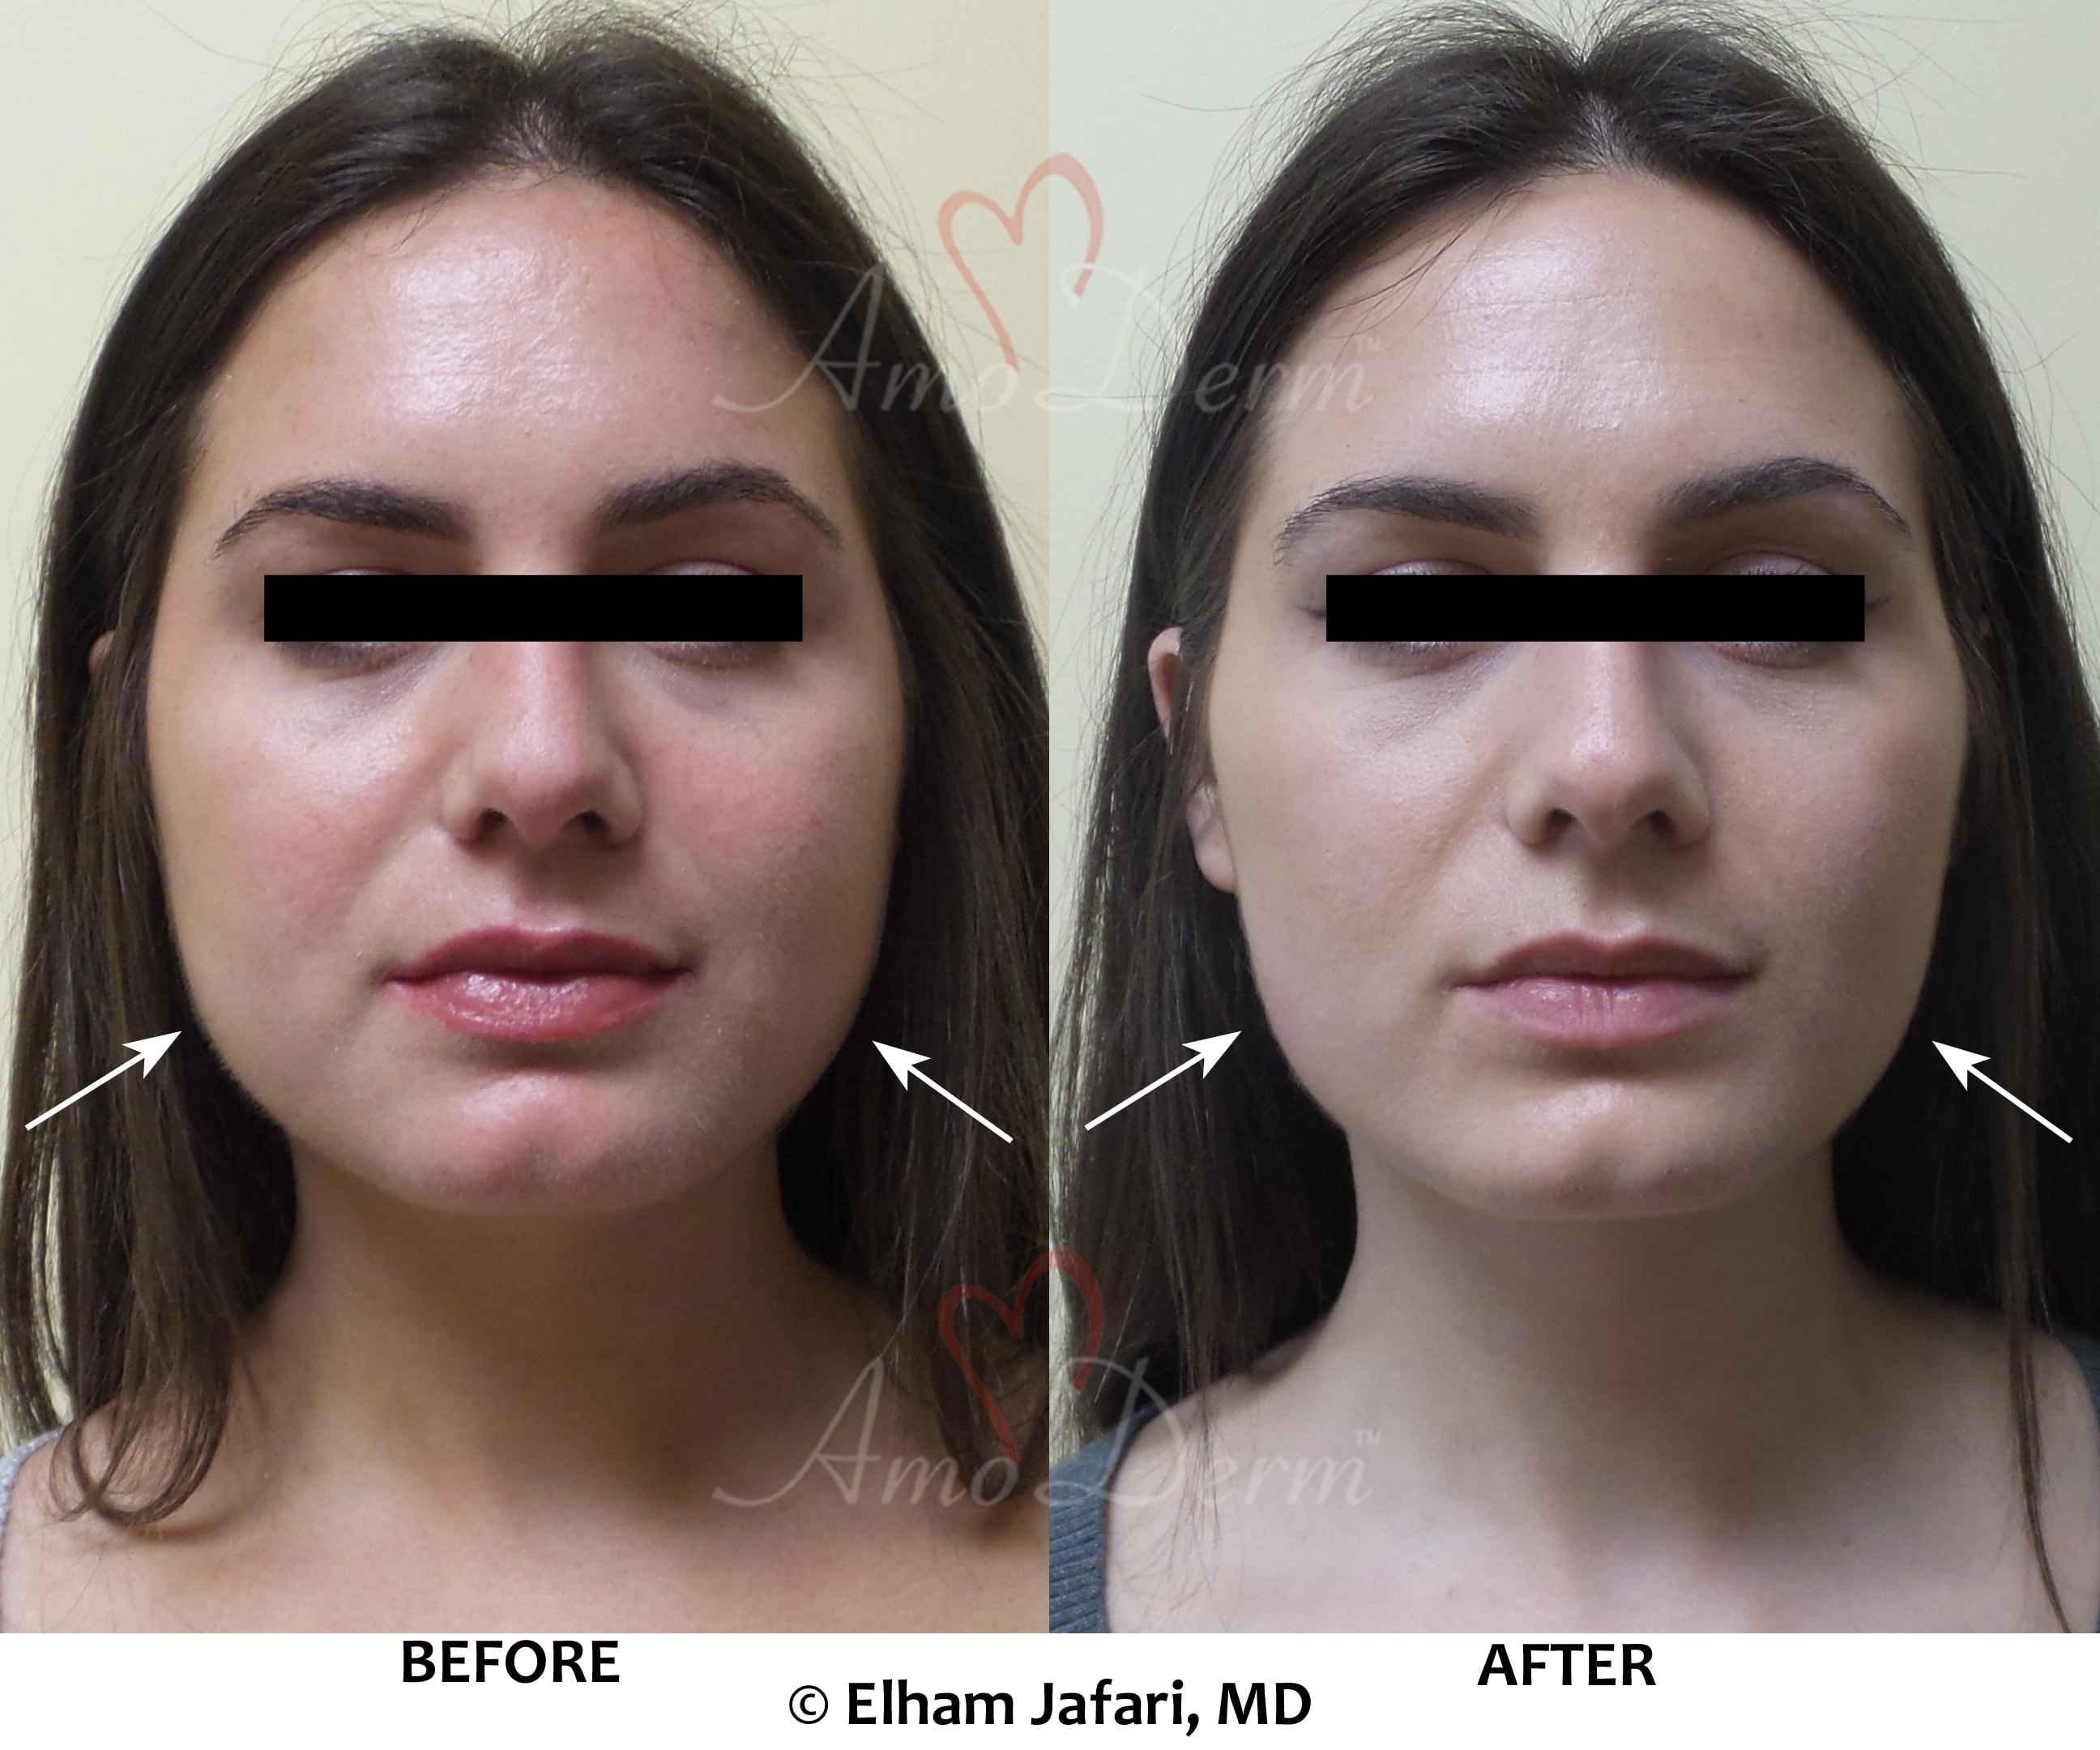 Irvine Botox® - Newport Beach and Orange County Botox Cosmetic